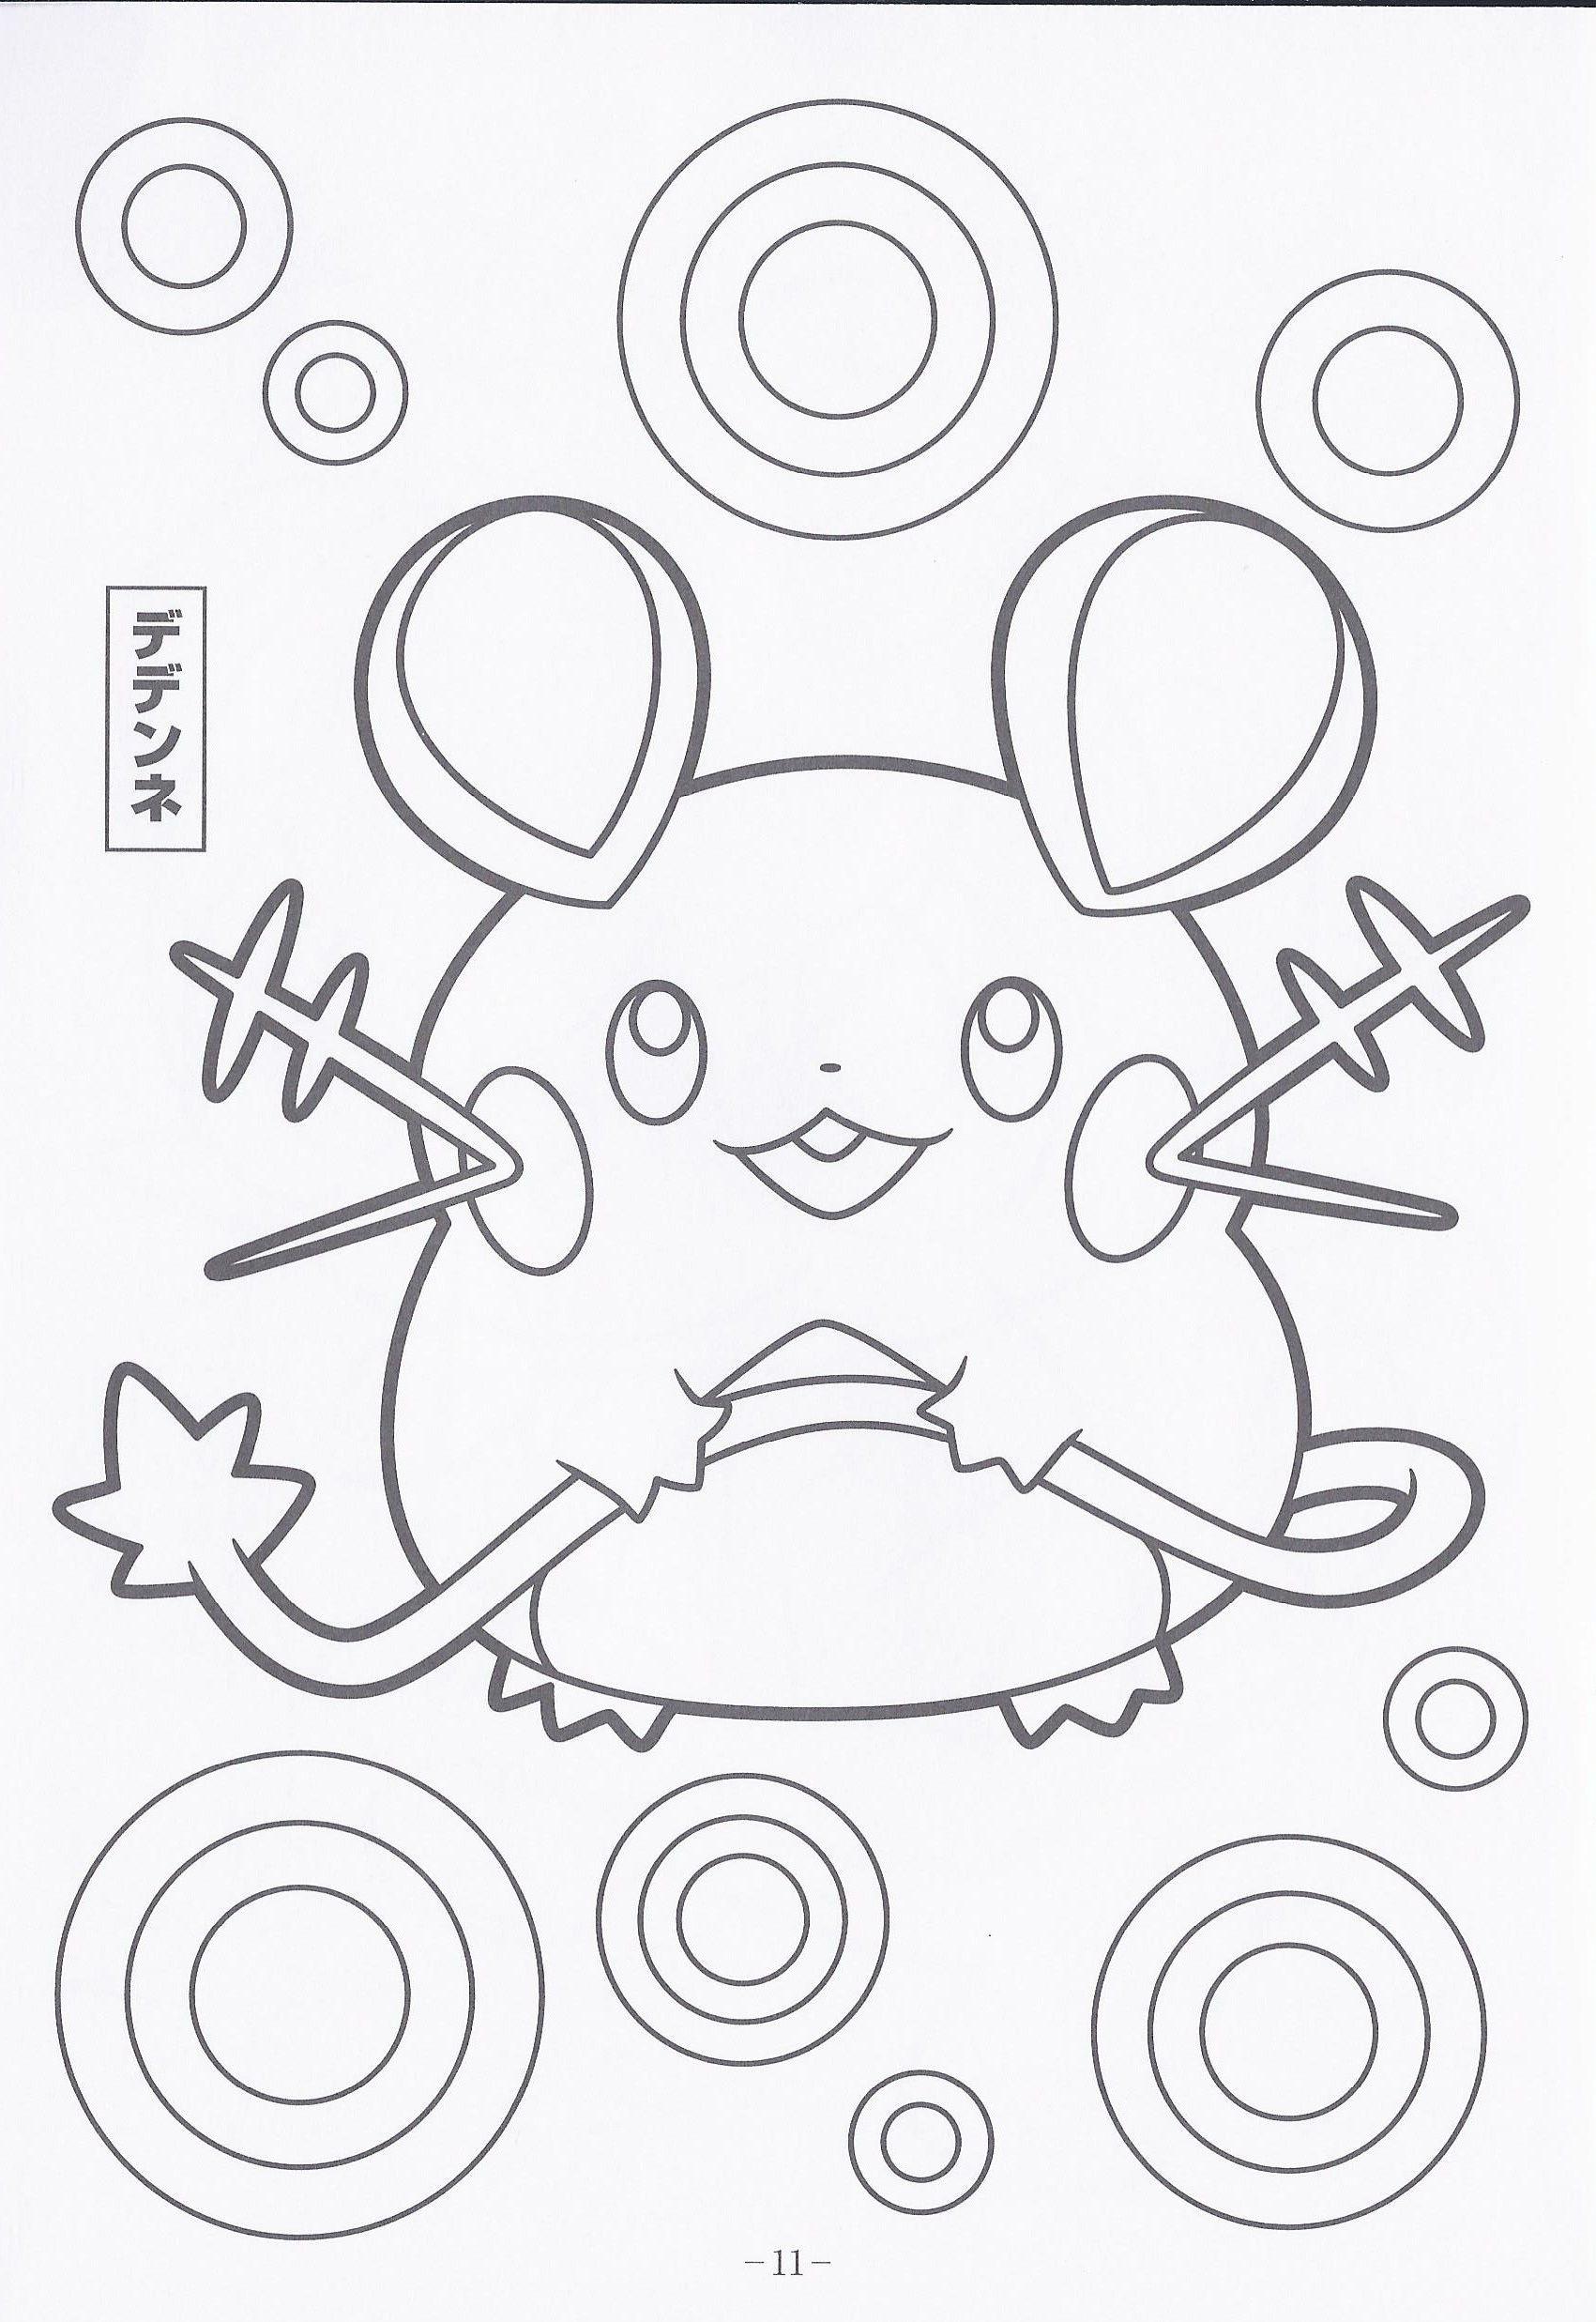 Pin De Ilysa Corns Em Pokemon Xy Coloring Colorir